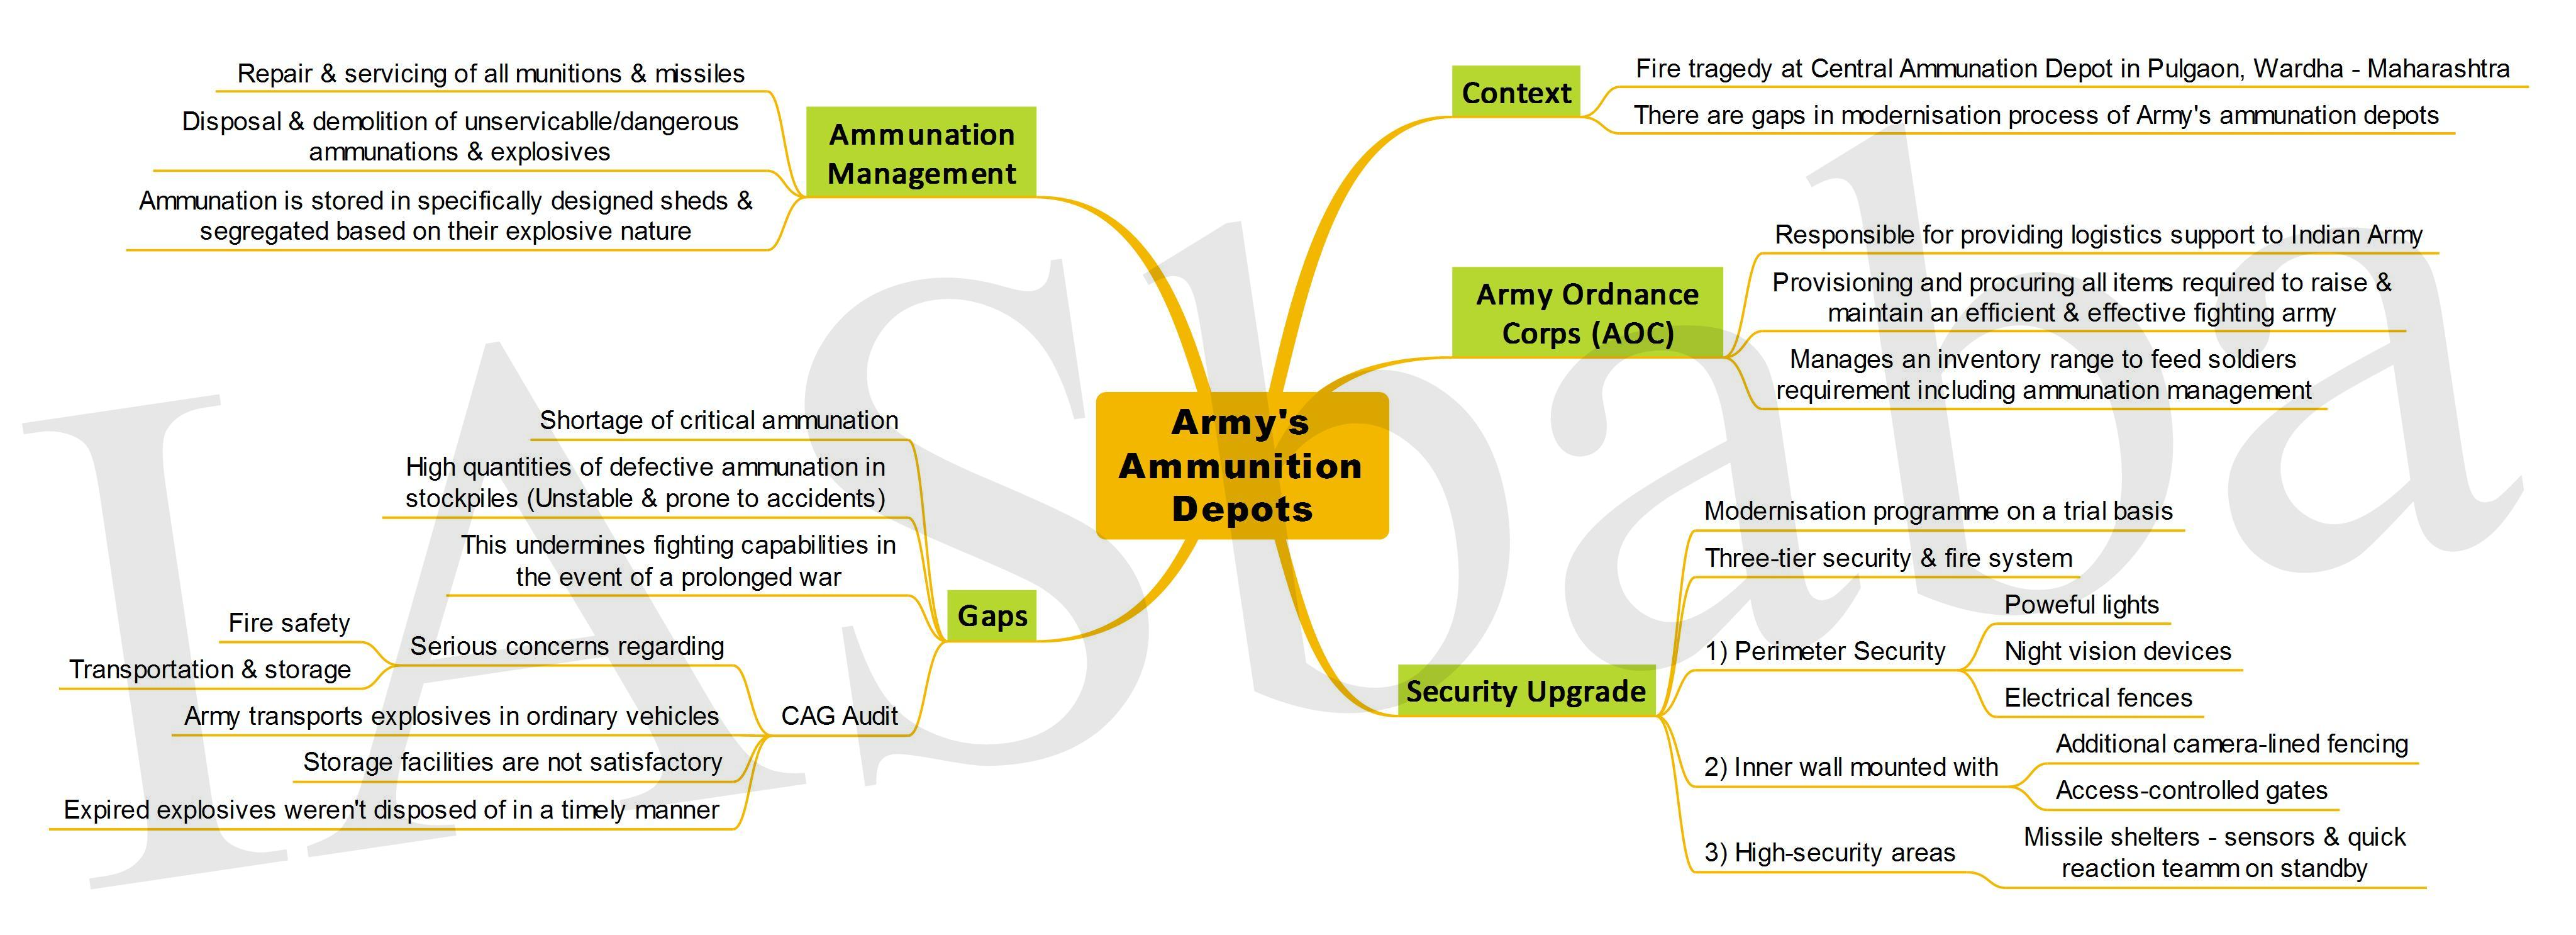 Armys Ammunition Depots-IASbaba